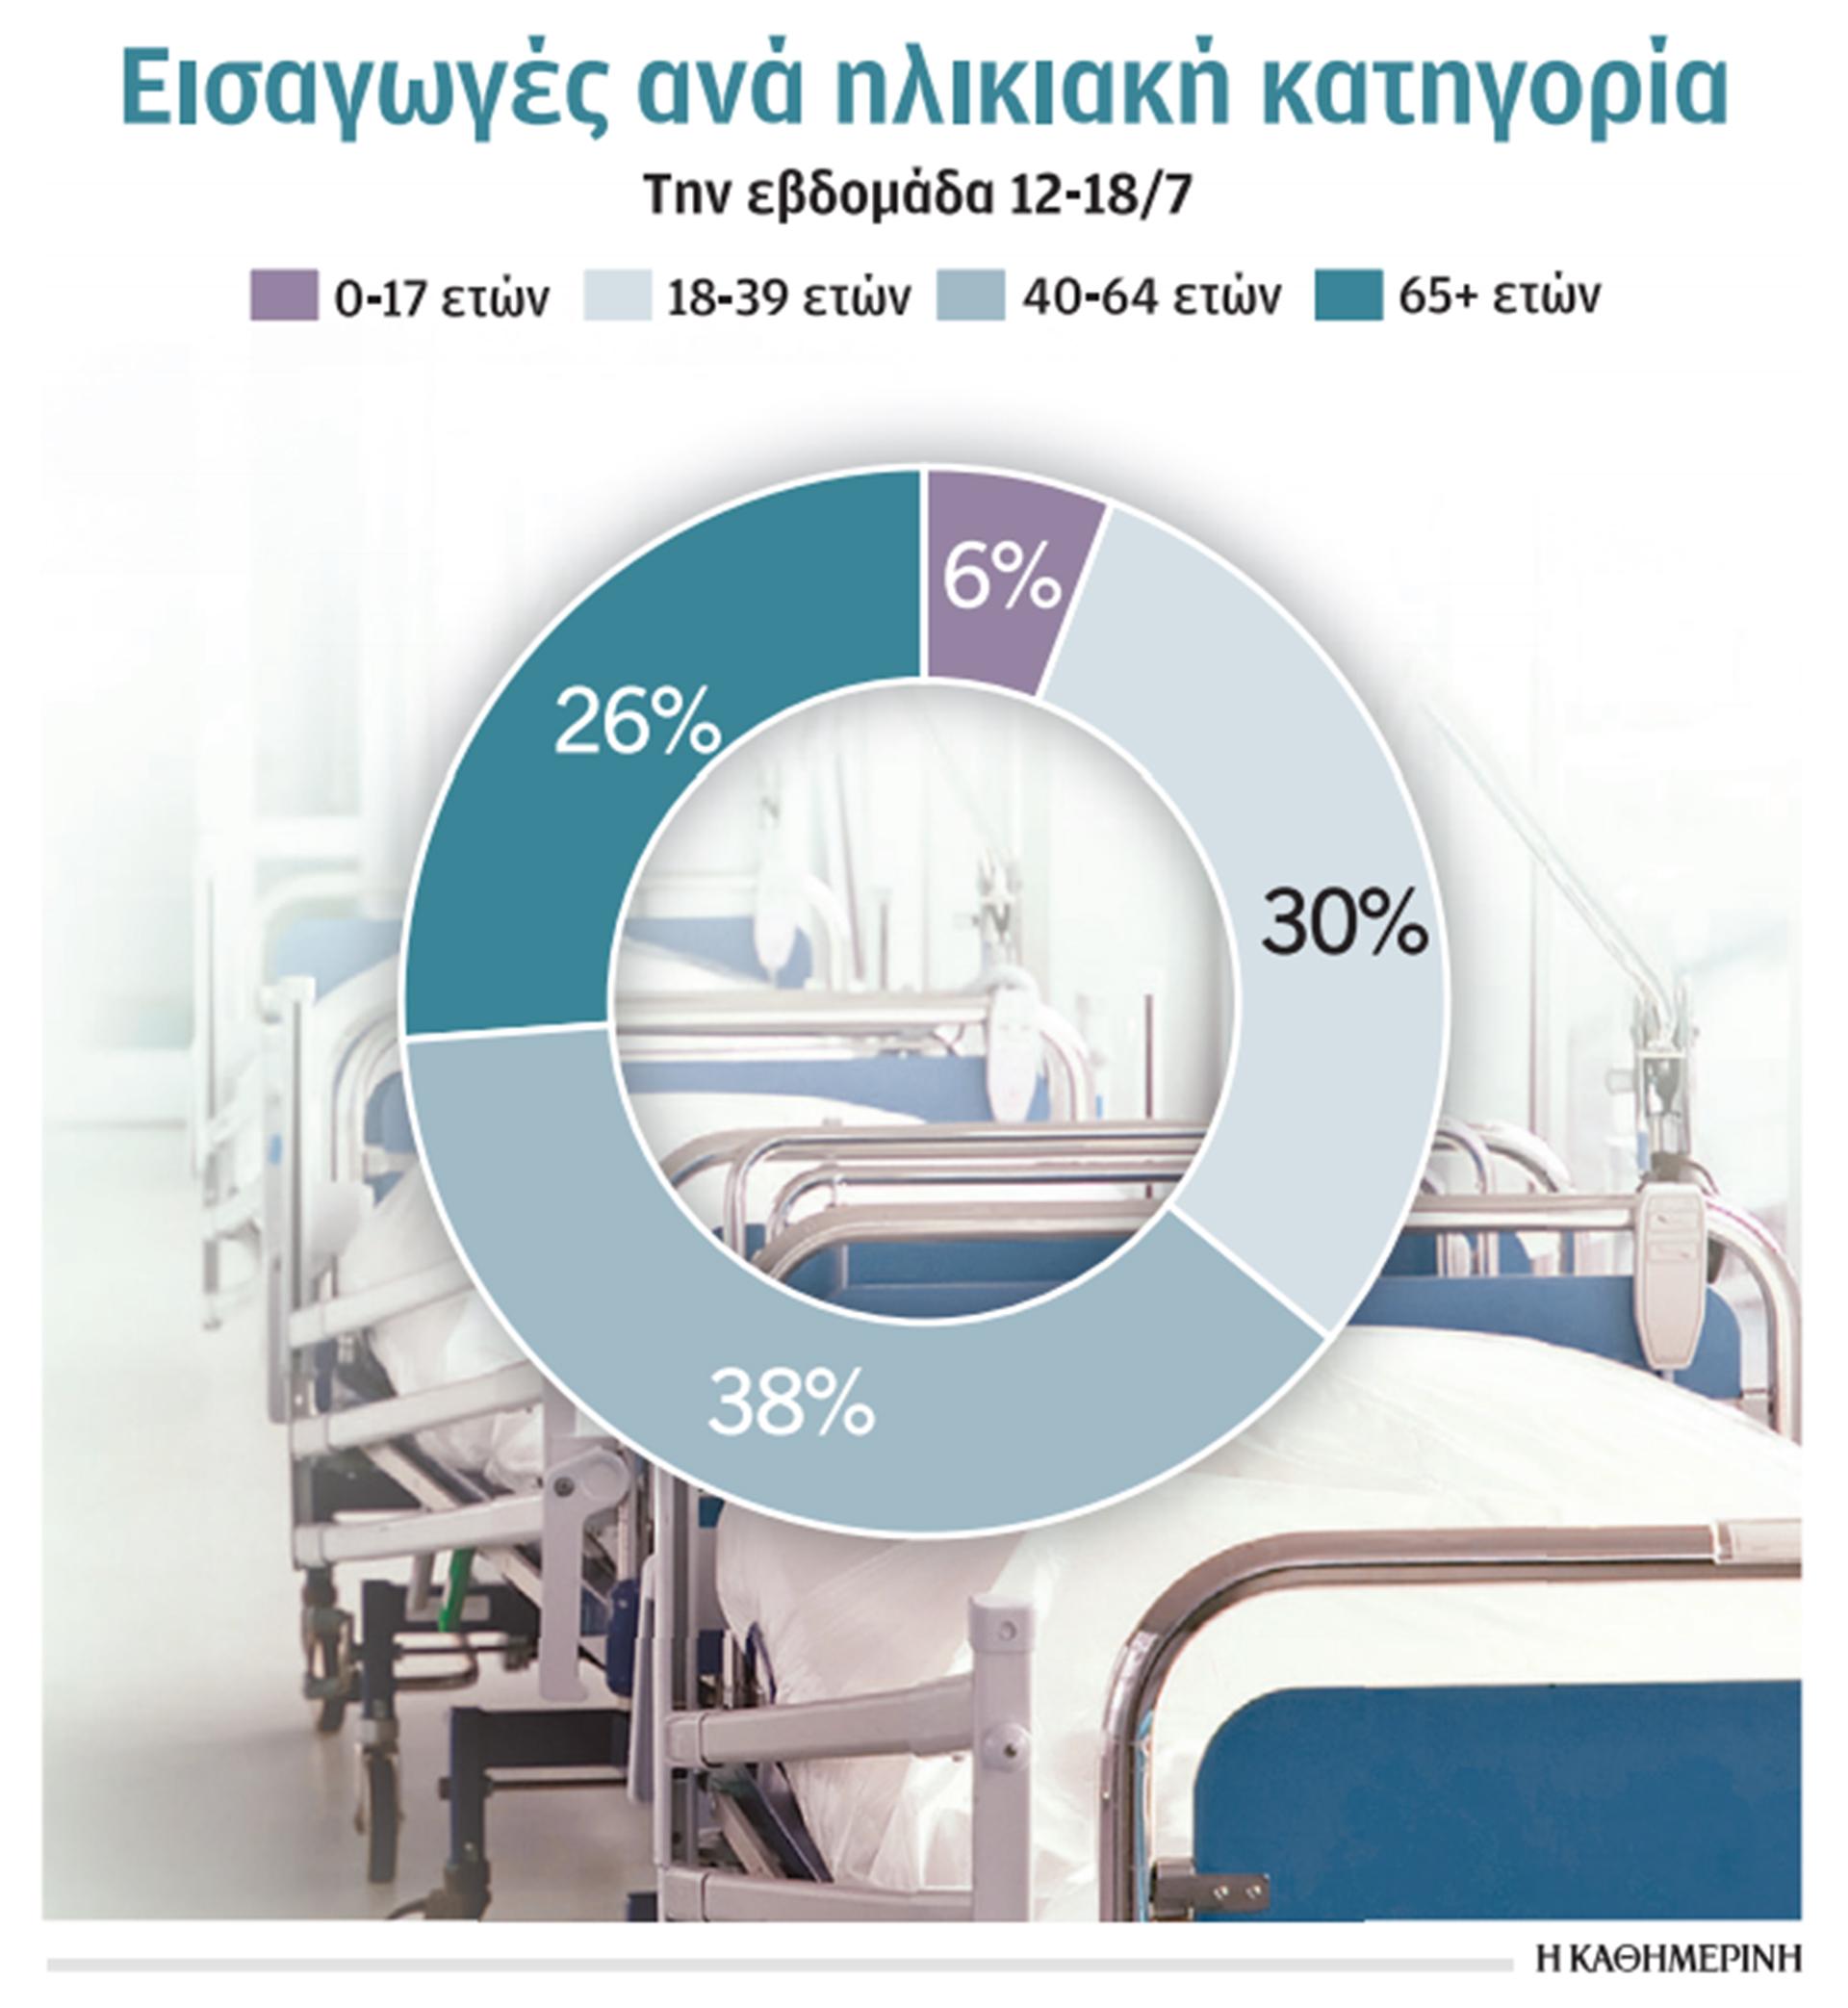 ypochreotikos-emvoliasmos-taim-aoyt-sta-epomena-vimata0